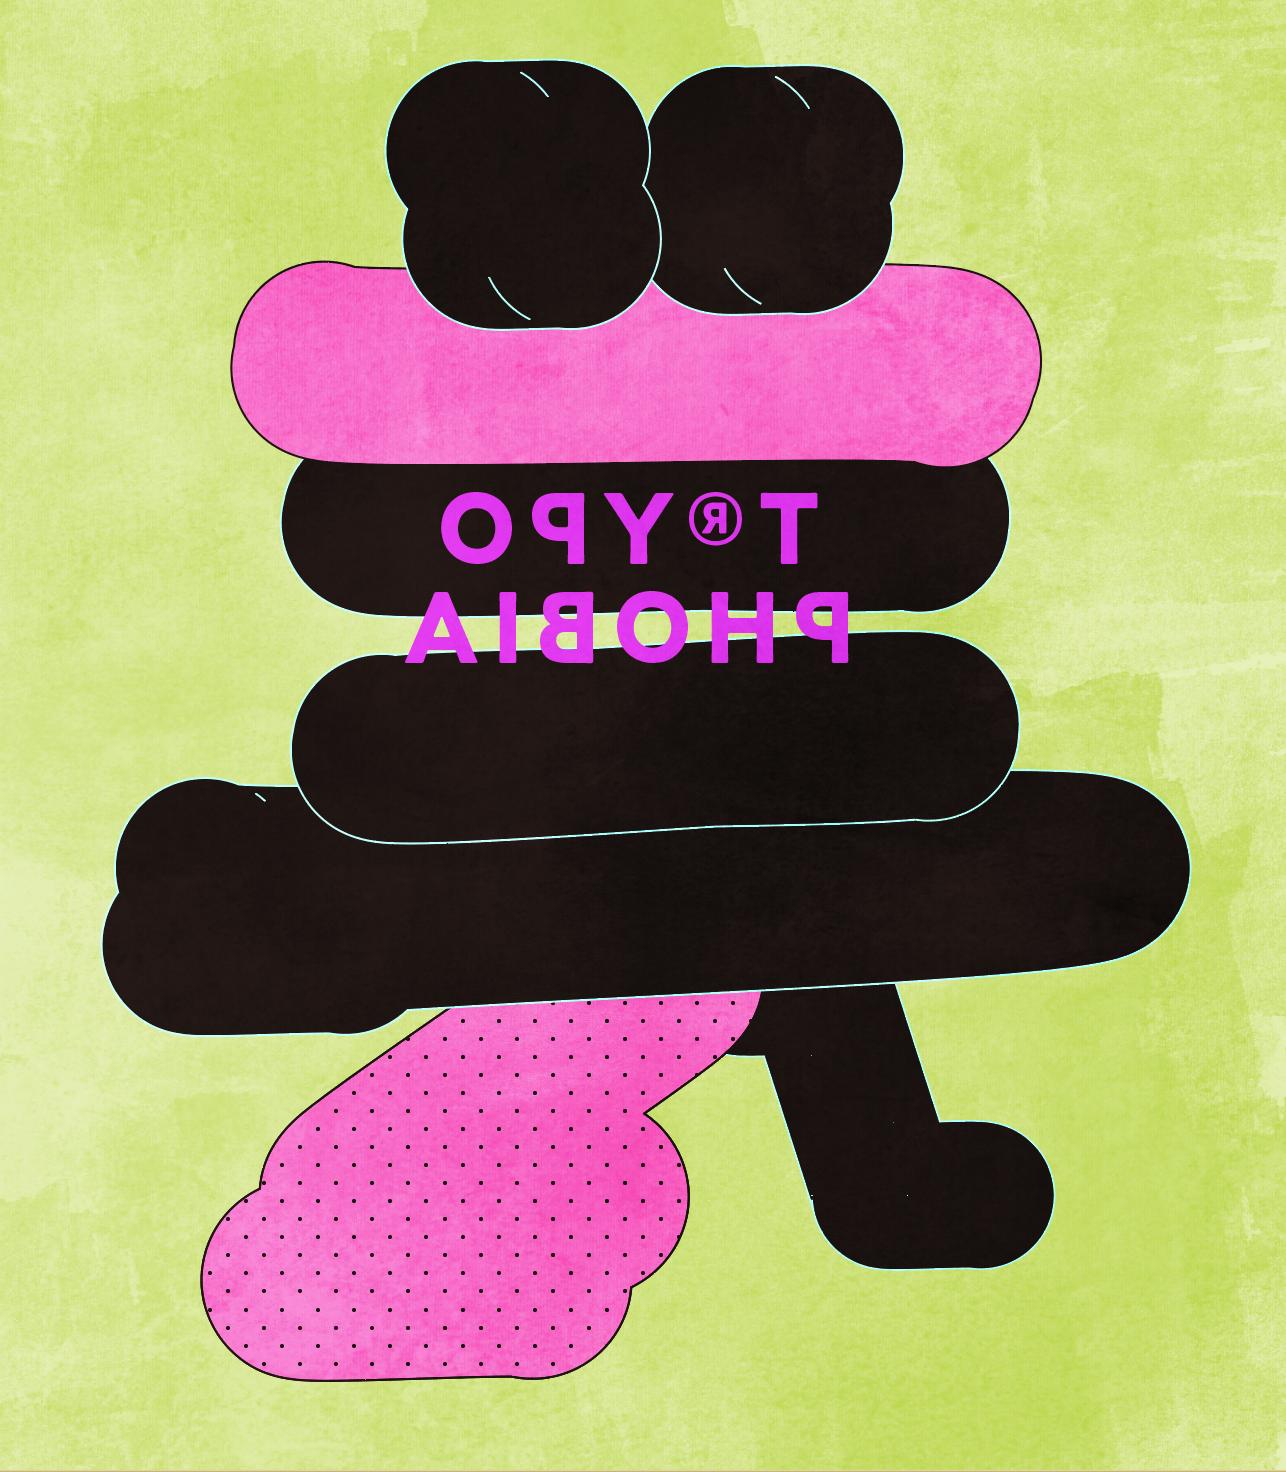 Eyemagit Ypophobia 16 漢字 美 Graphicdesign Poster Postereveryday Designeveryday Posterdesign Typography Typo Design Art Con グラフィックアート デザイン グラフィックデザイン